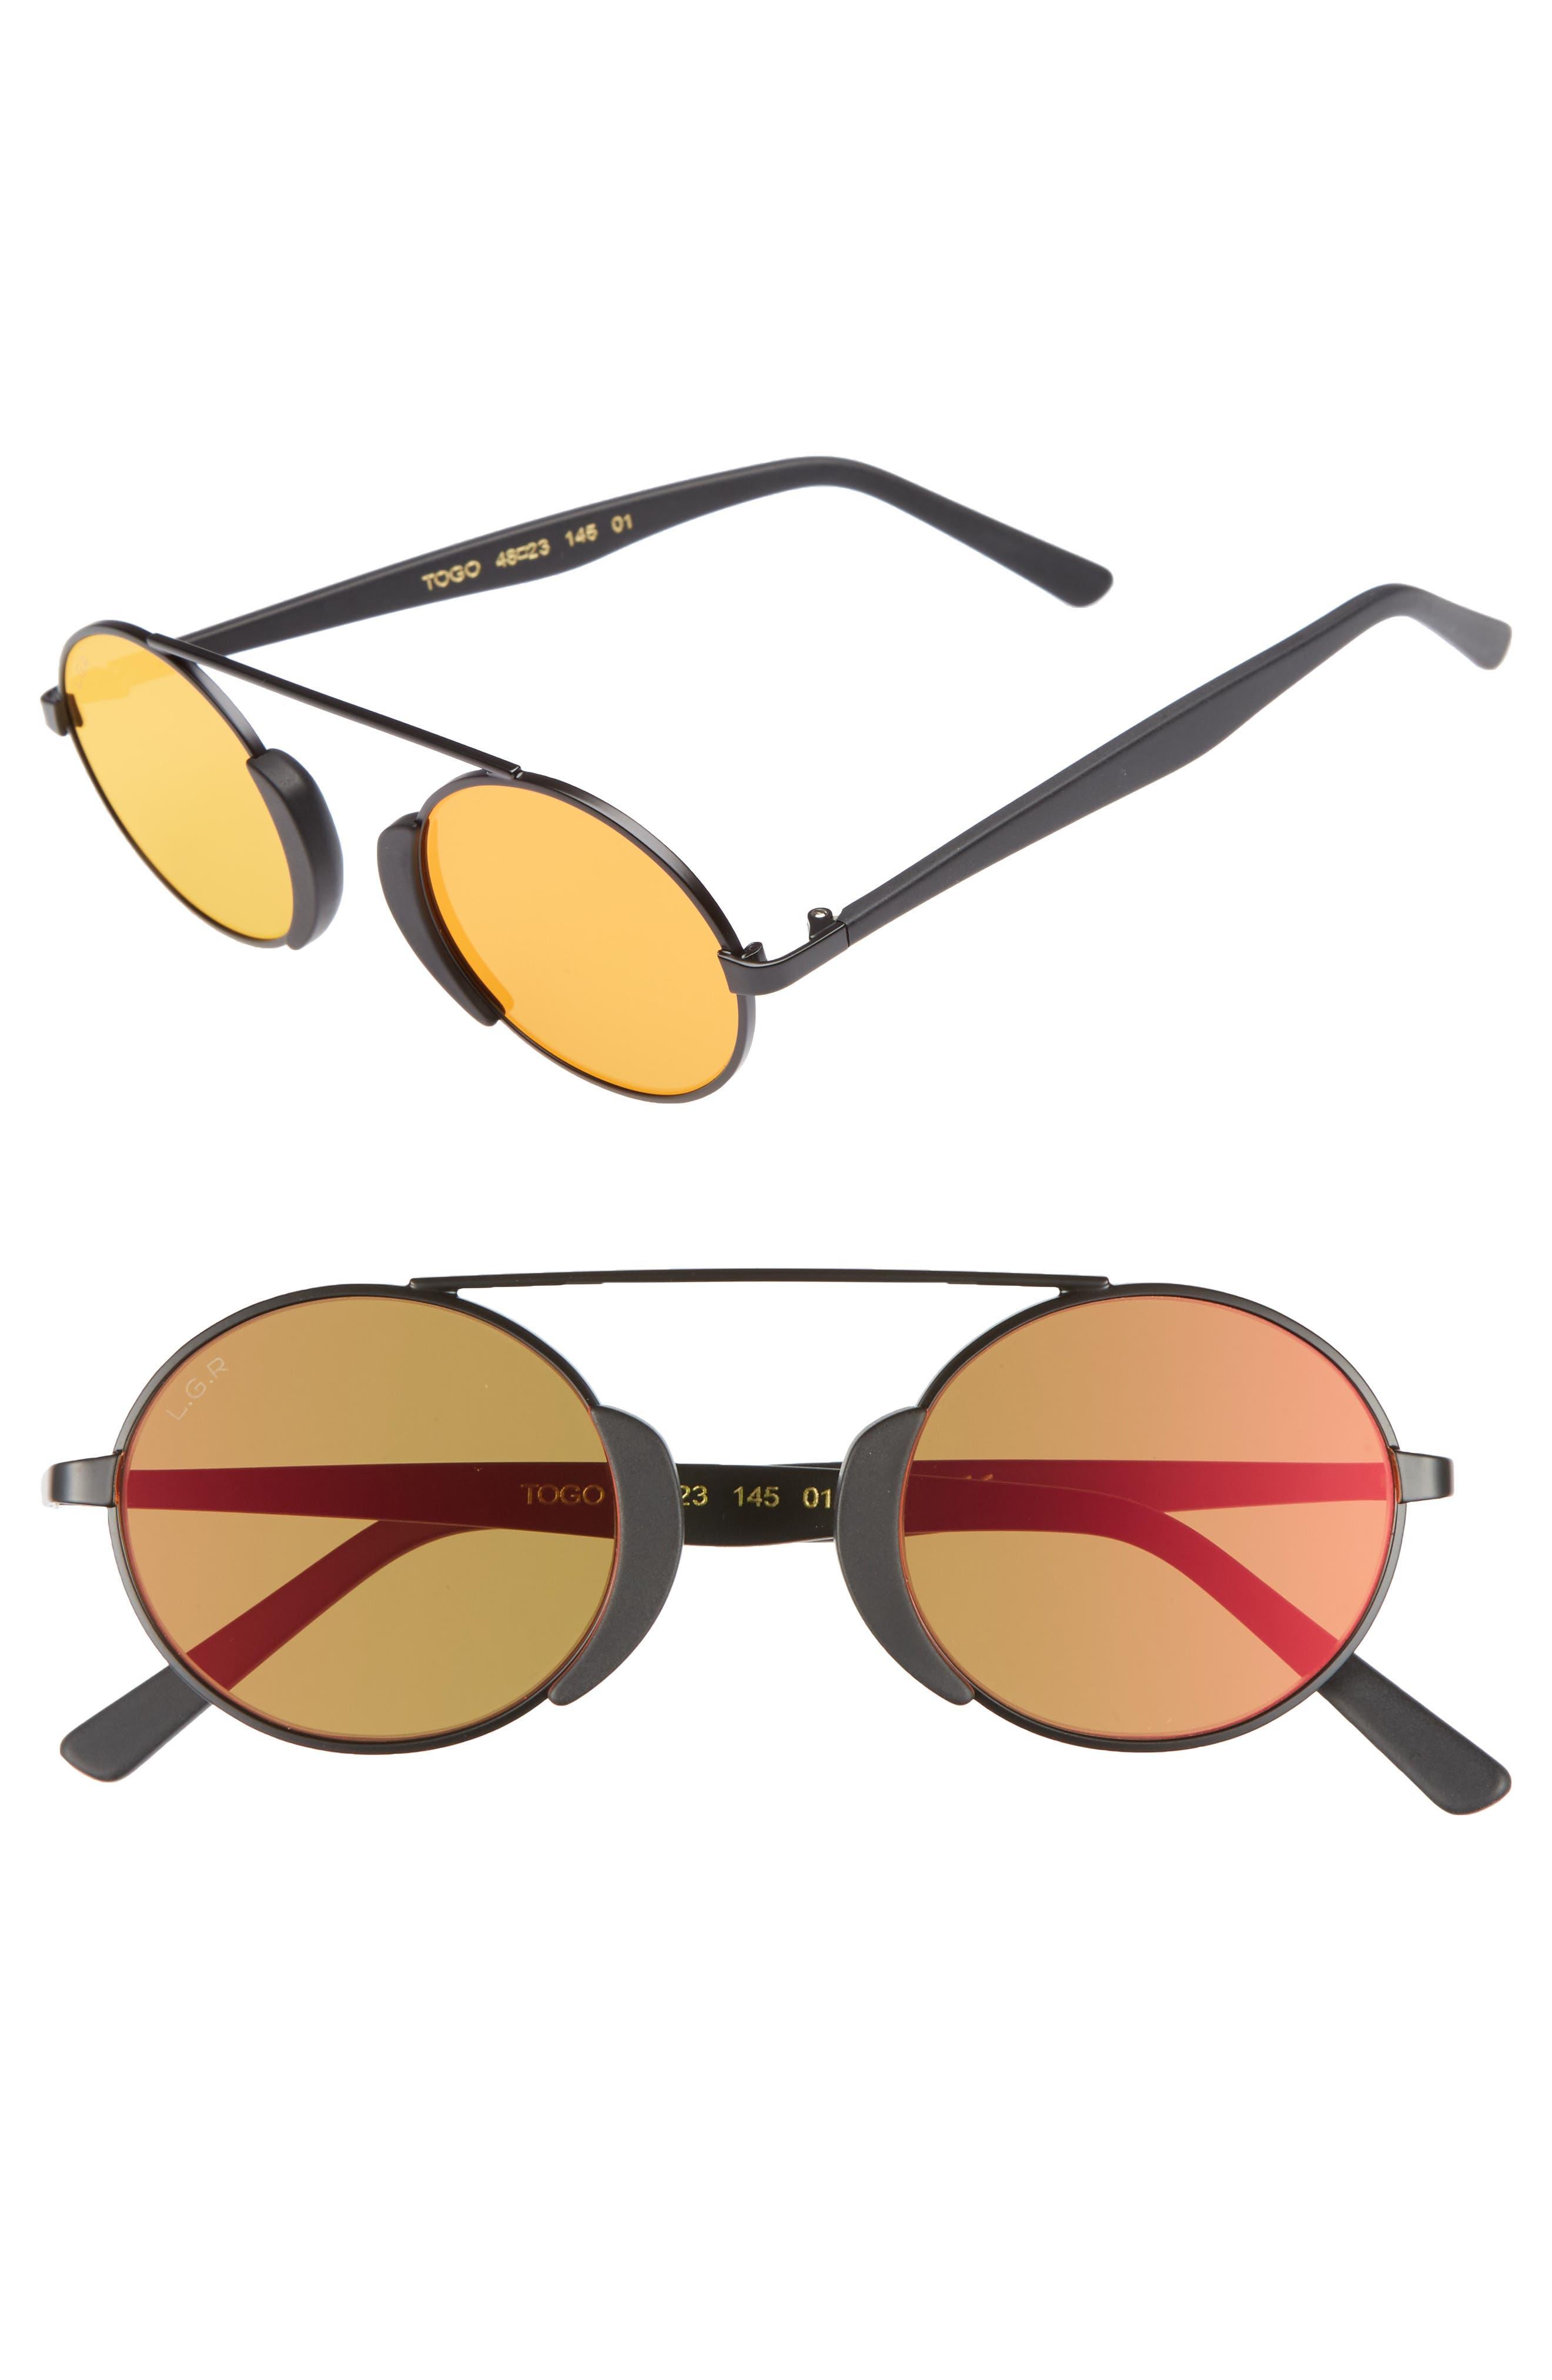 Alternate Image 1 Selected - L.G.R Togo 48mm Sunglasses